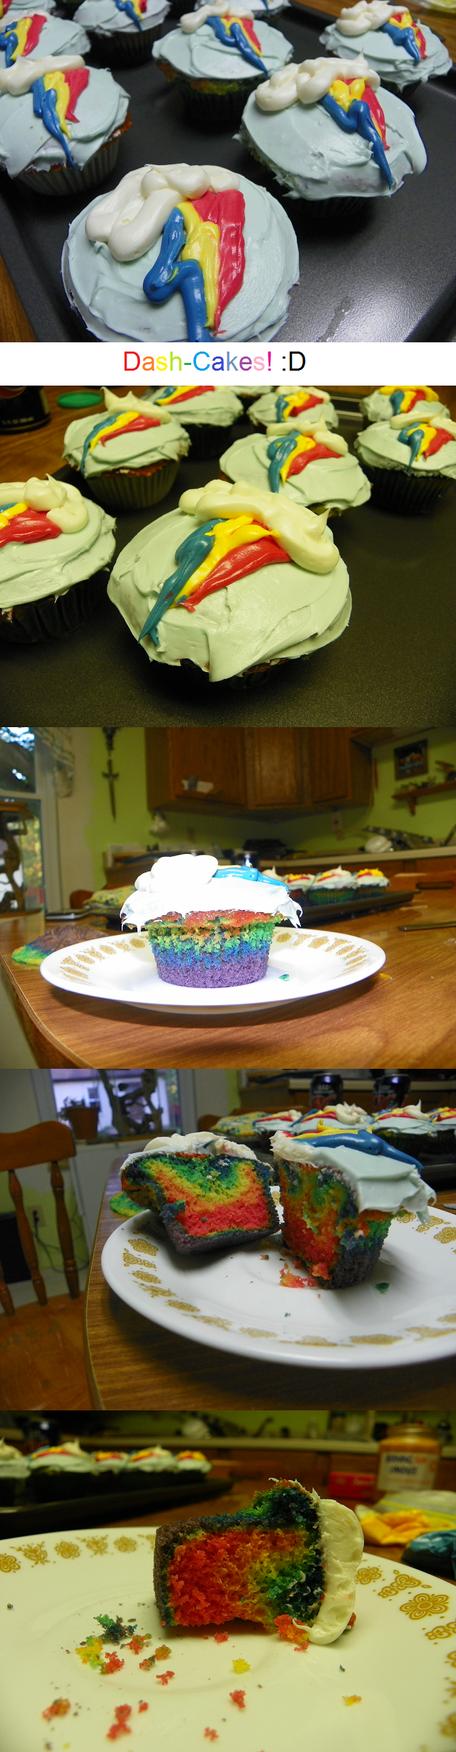 Rainbow DASH Cupcakes :D by MysteryUser101